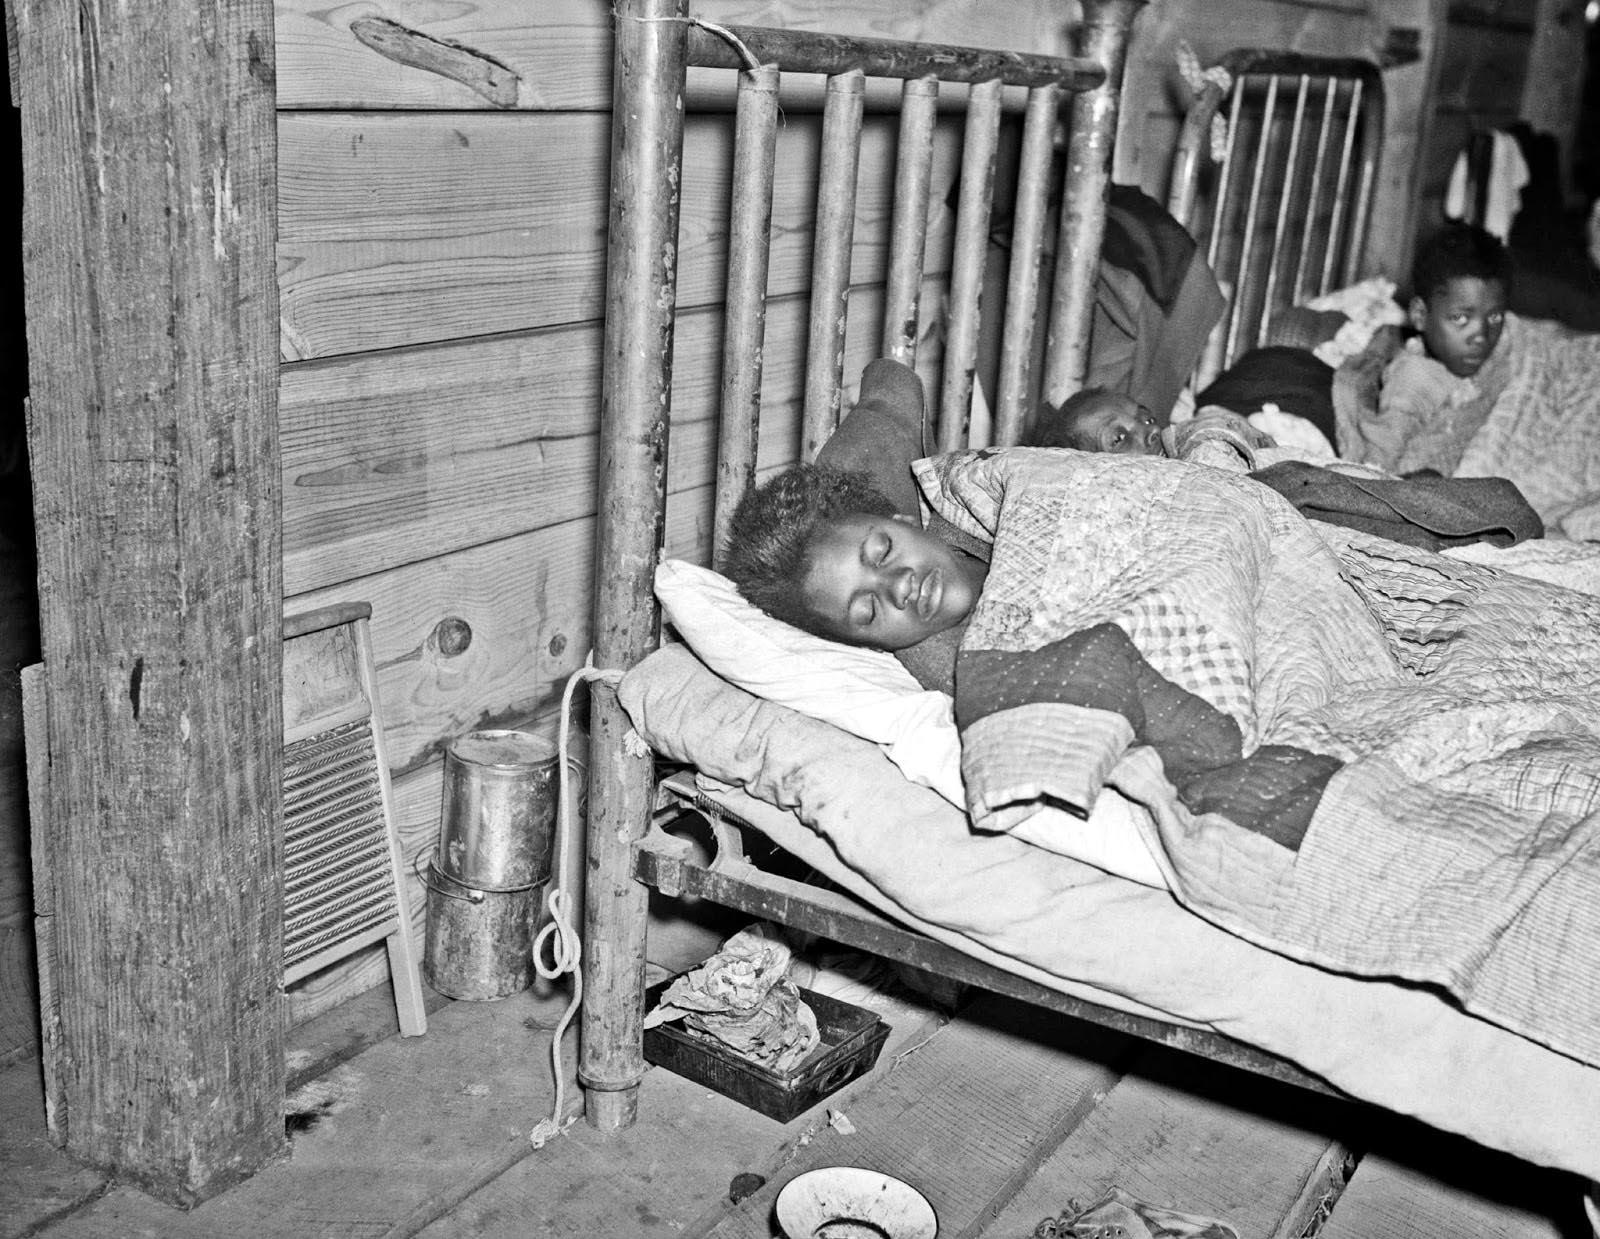 Red Cross infirmary, Arkansas, 1937. © Walker Evans